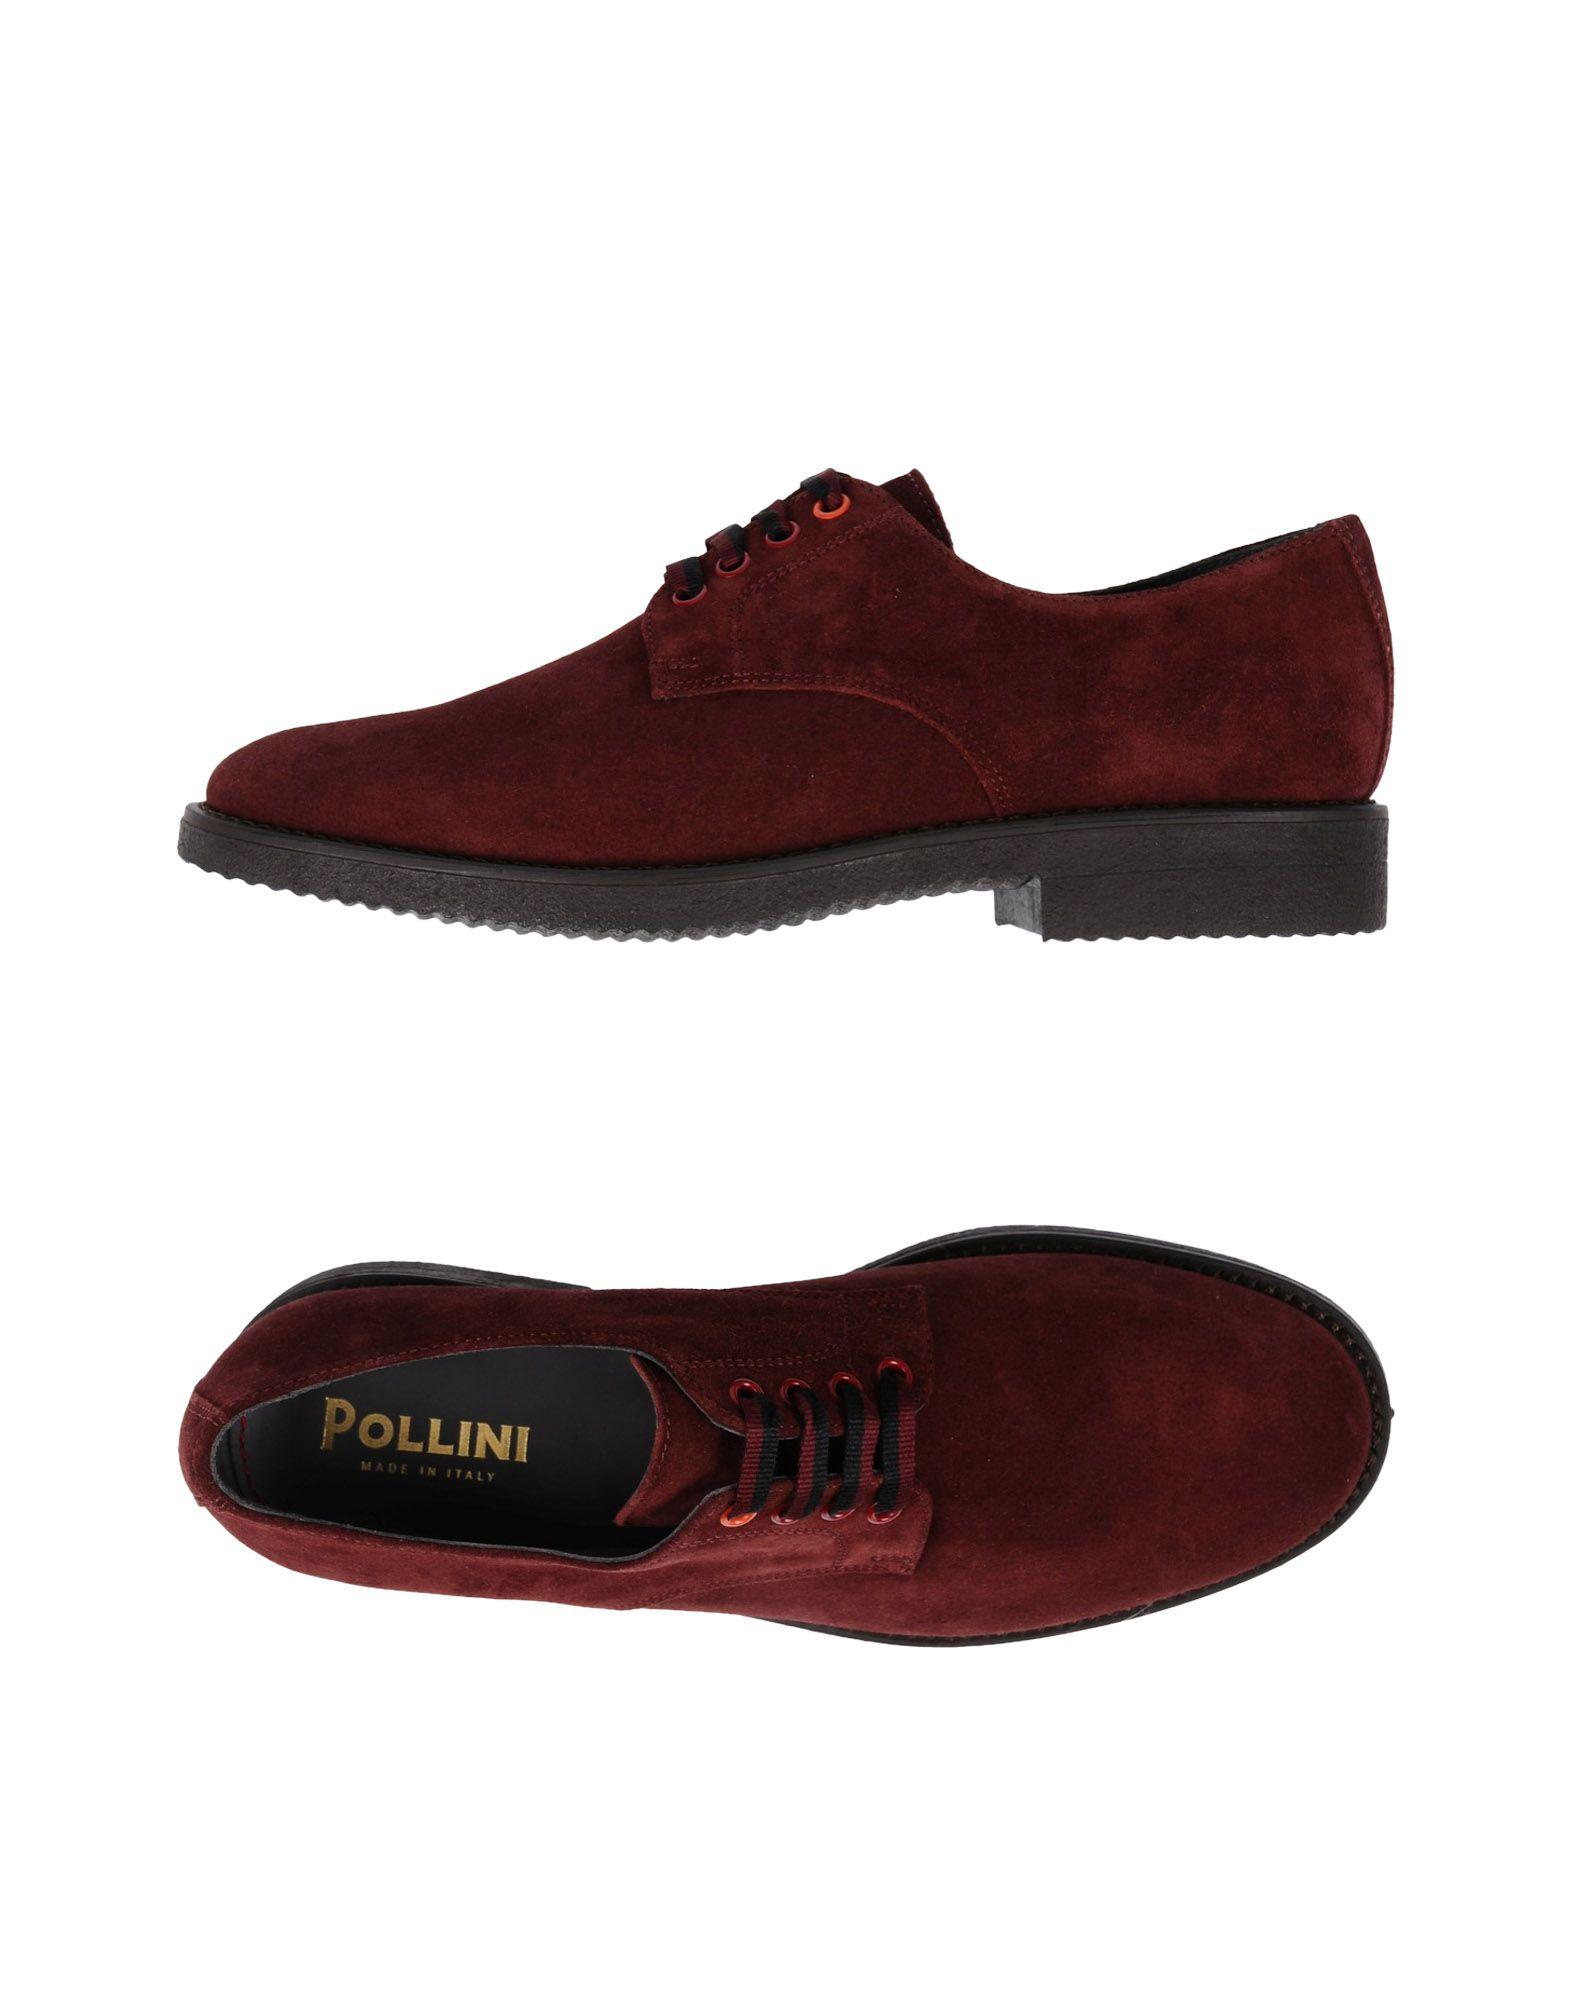 Pollini Heiße Schnürschuhe Herren  11447988EX Heiße Pollini Schuhe 8da278